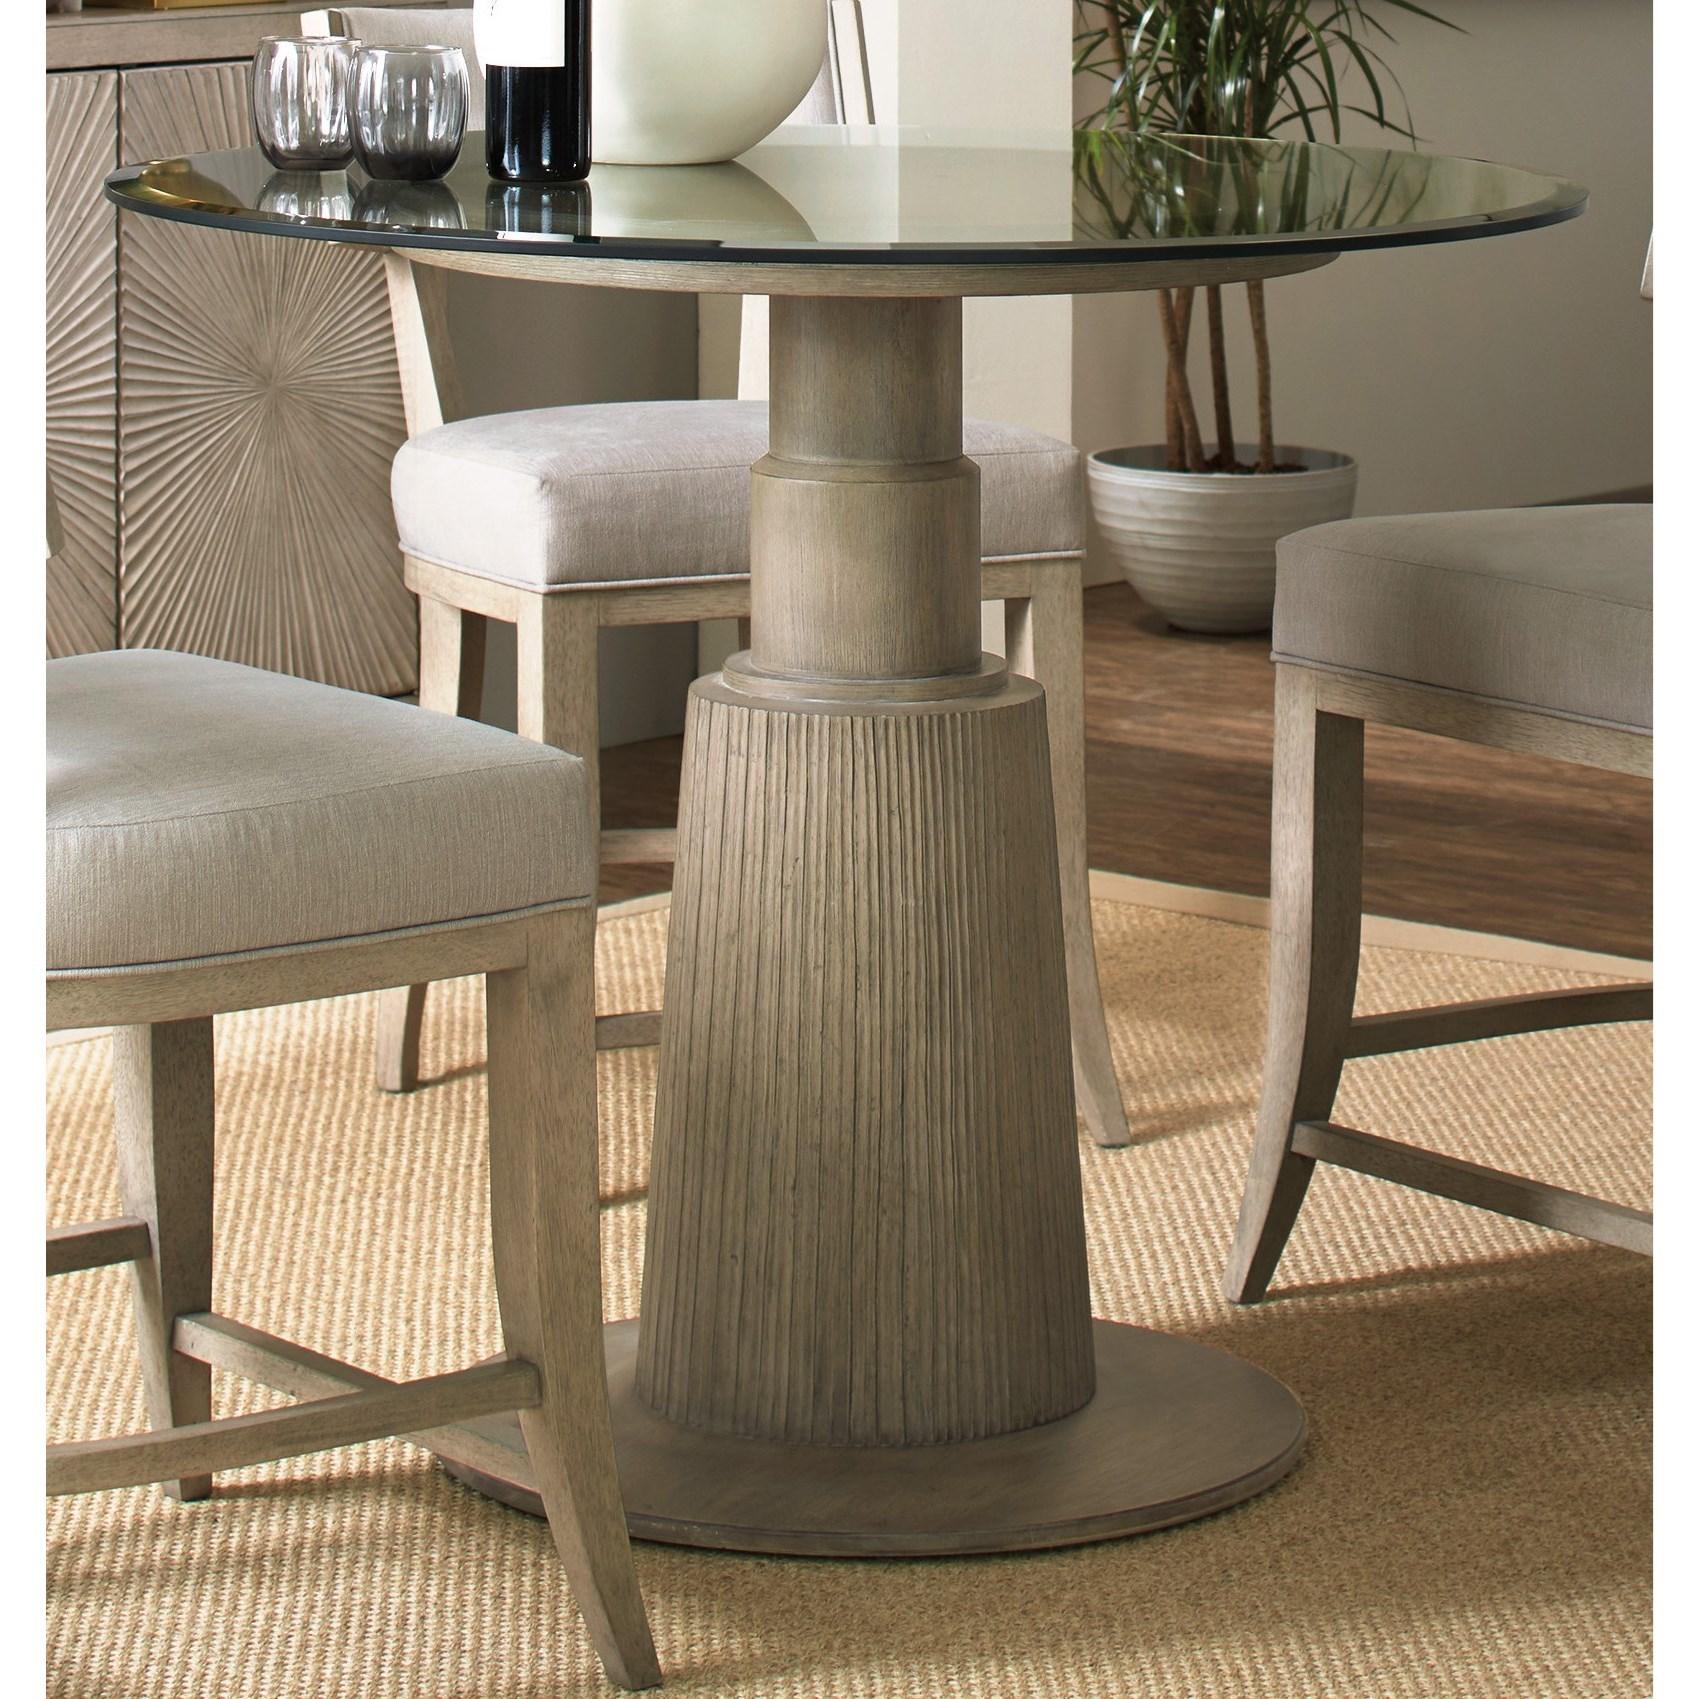 Elegant Hooker Furniture ElixirAdjustable Height Round Dining Table ...